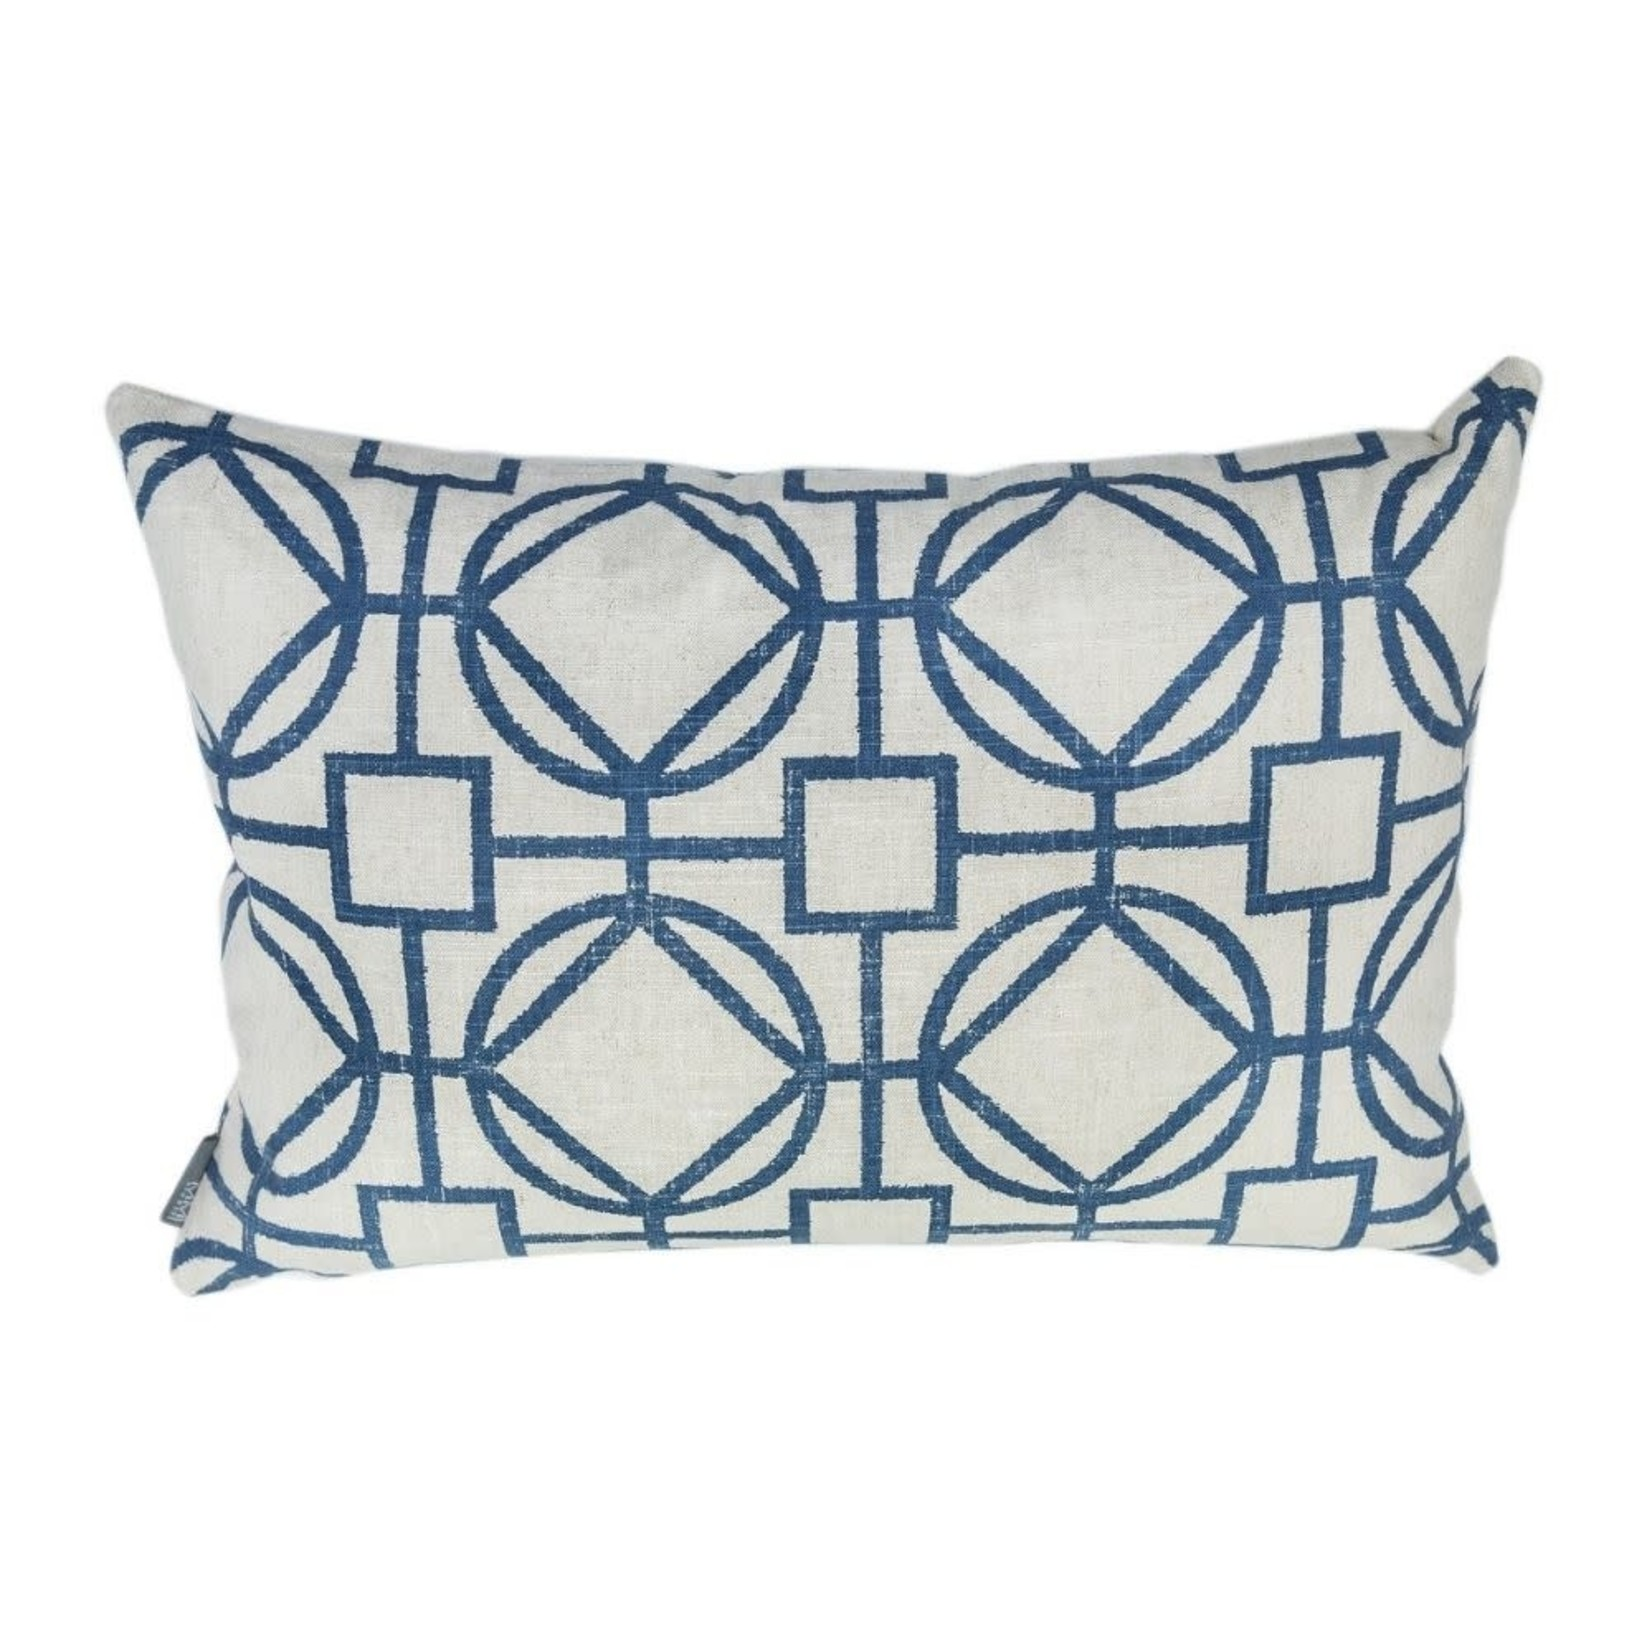 Suri Bluebird Pillow